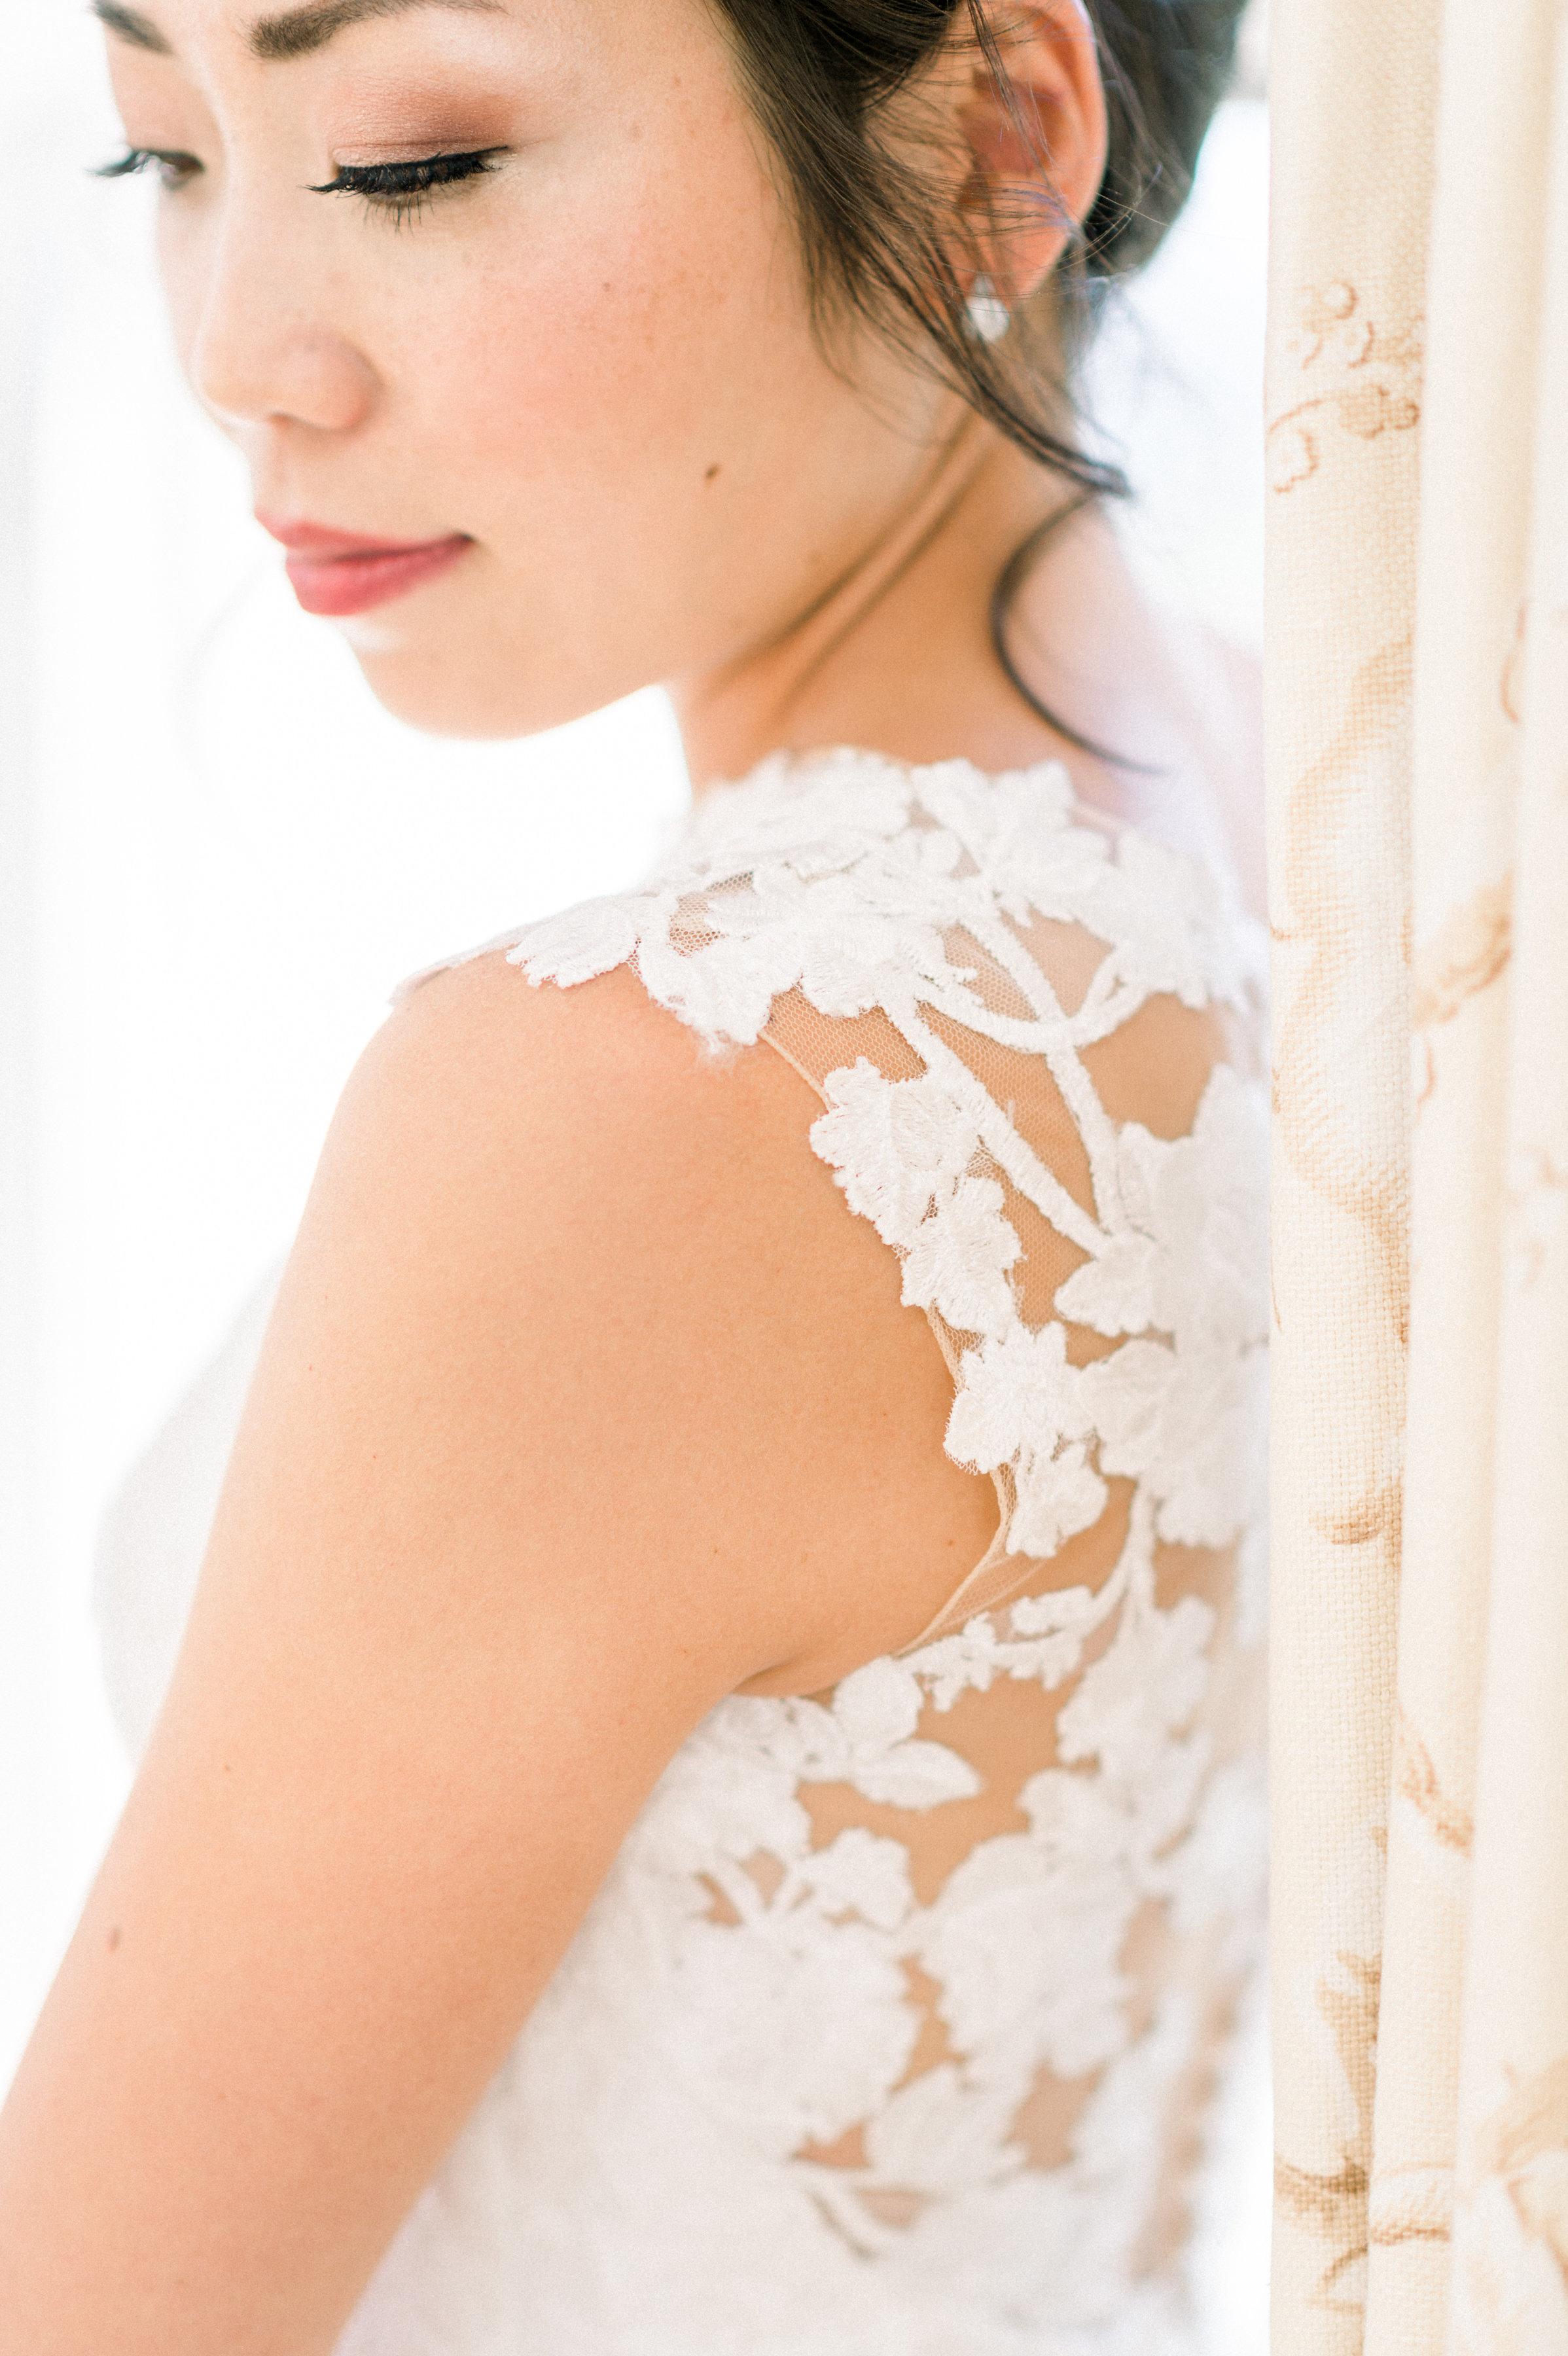 Mamiko-Aaron-Wedding-Whitney-Heard-Photography-4908.jpg